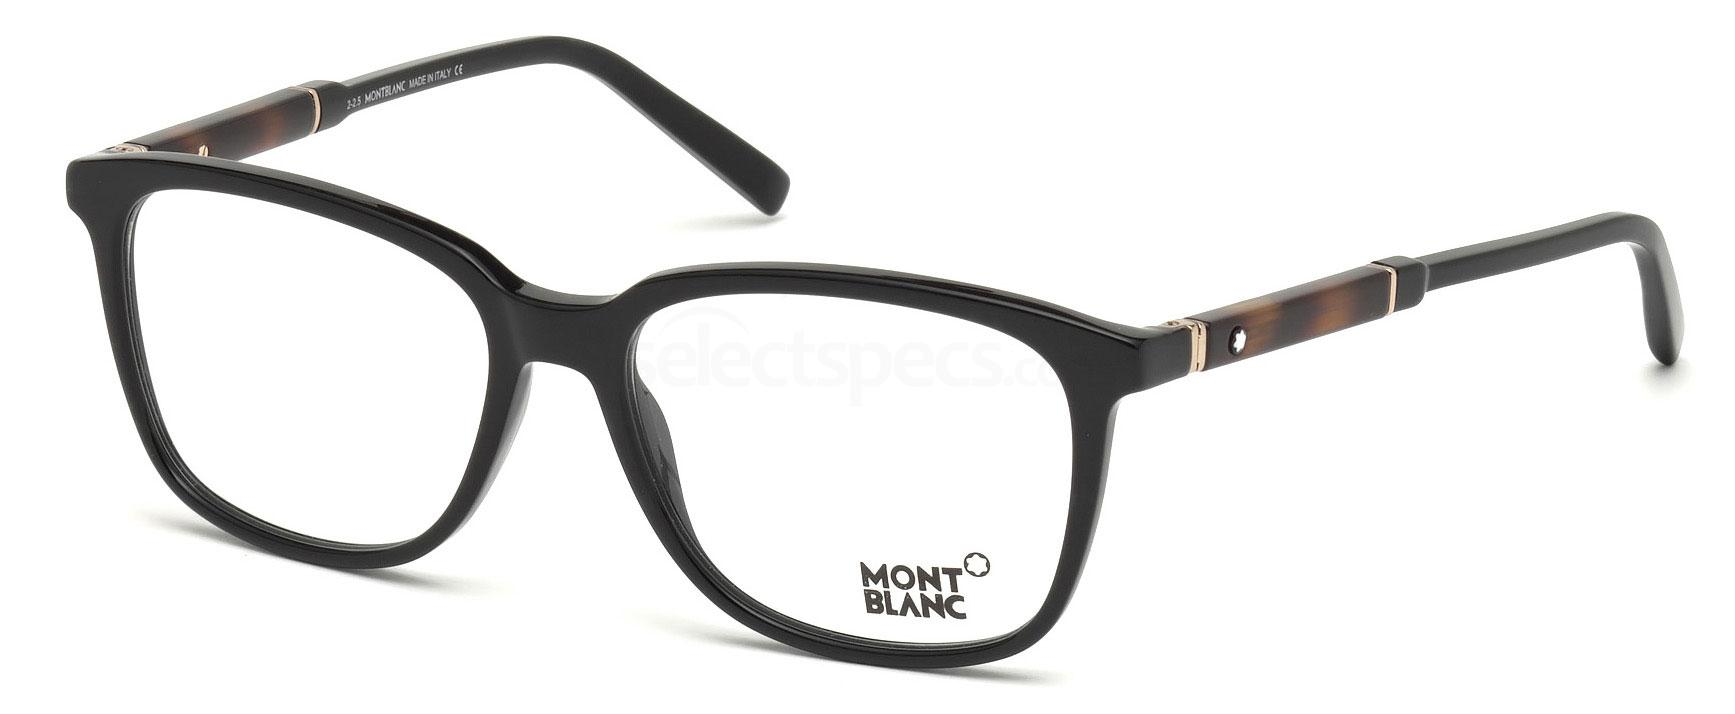 005 MB0620 , Mont Blanc